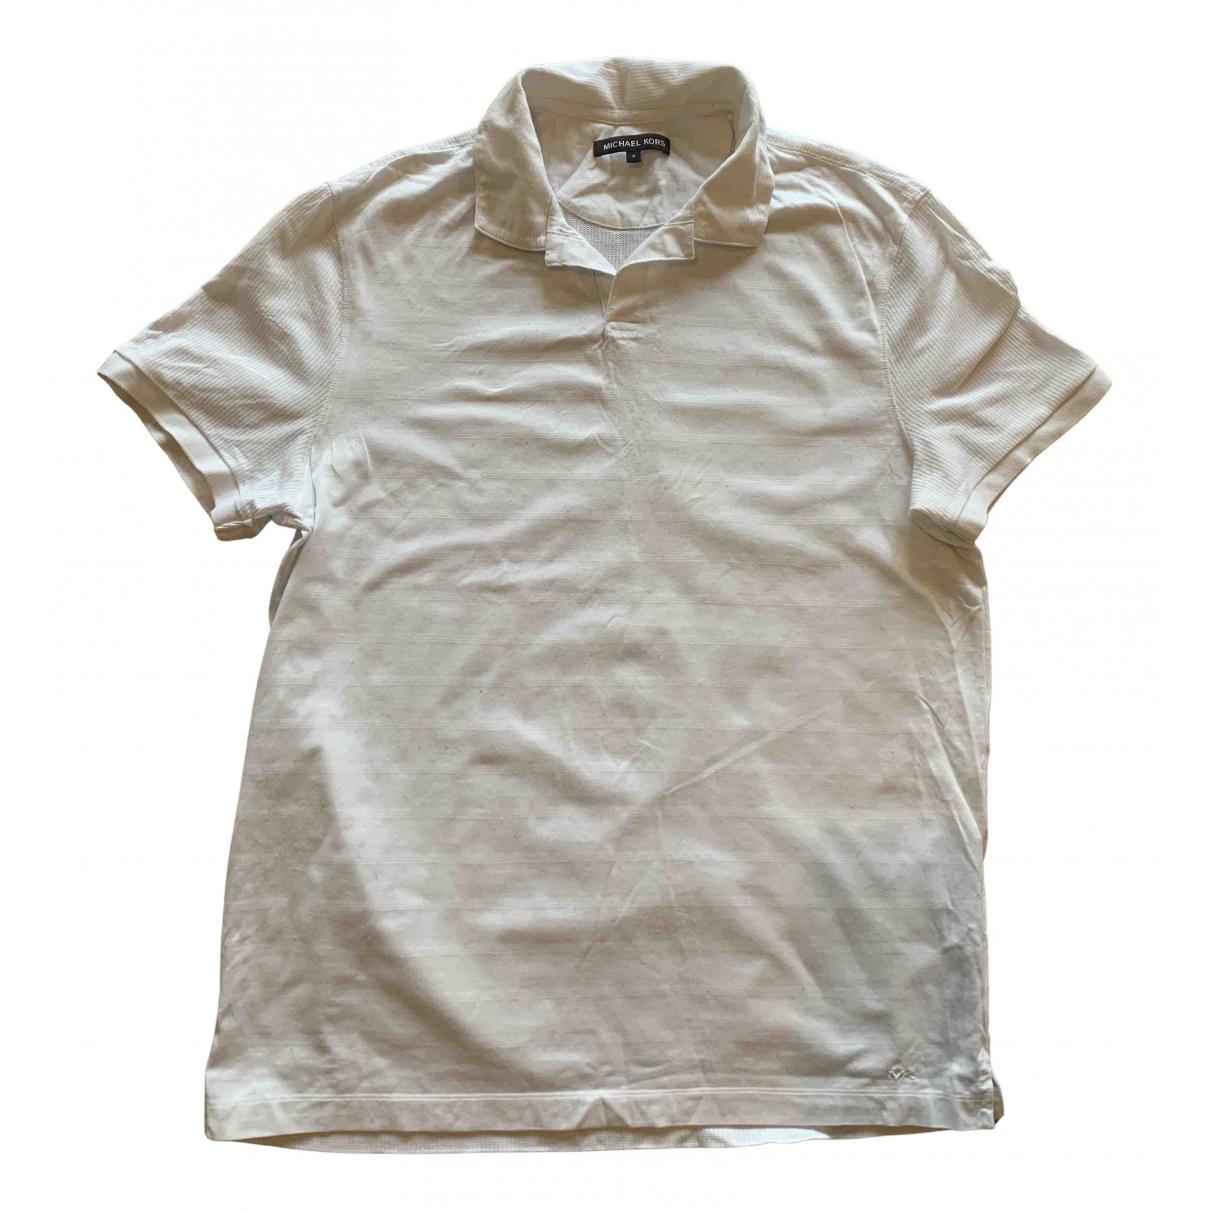 Michael Kors N White Cotton Polo shirts for Men M International